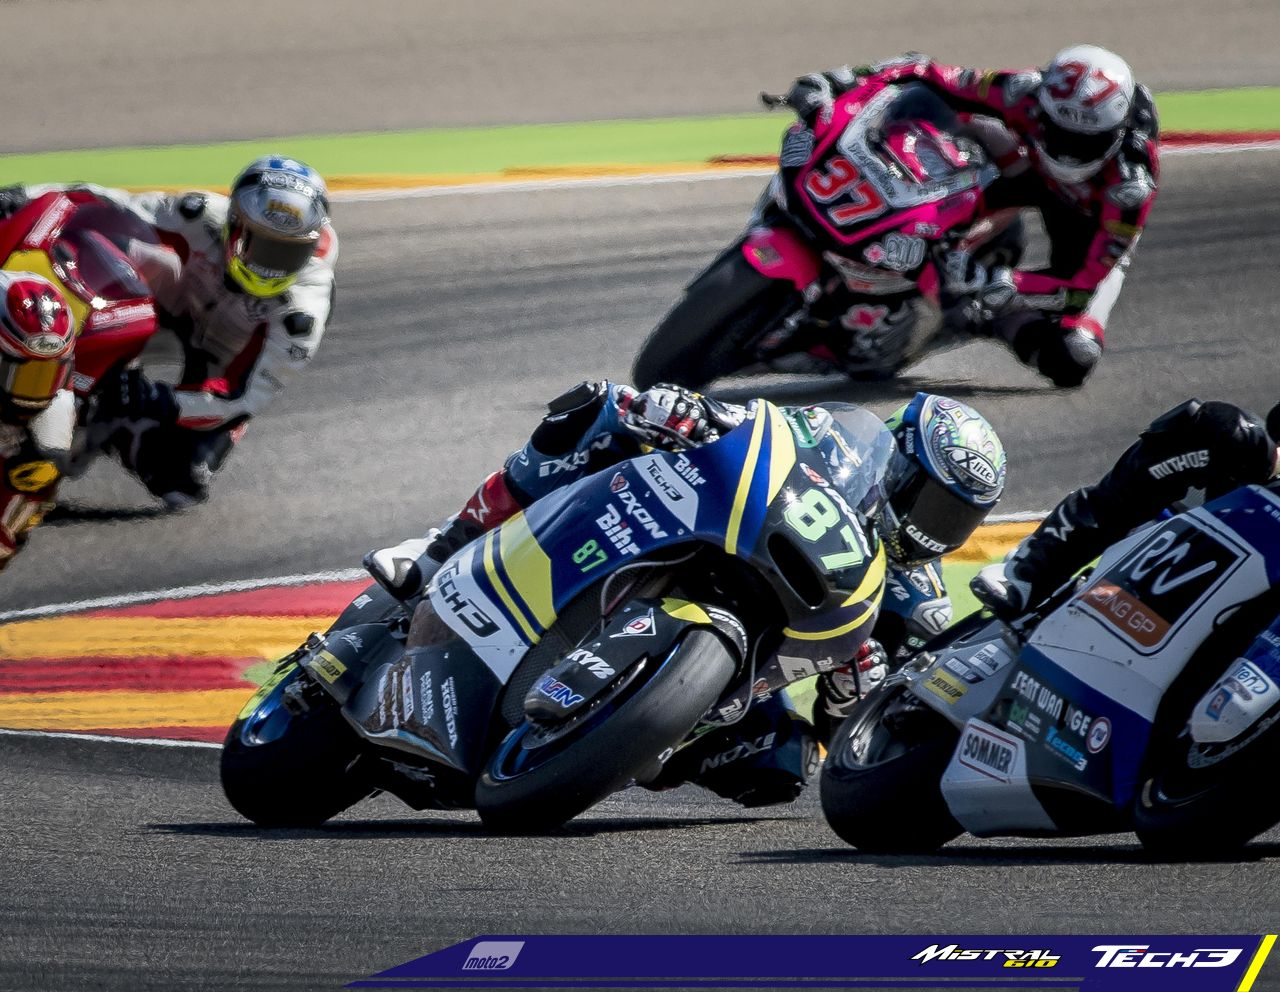 GP14 - Spain - Aragon 2017